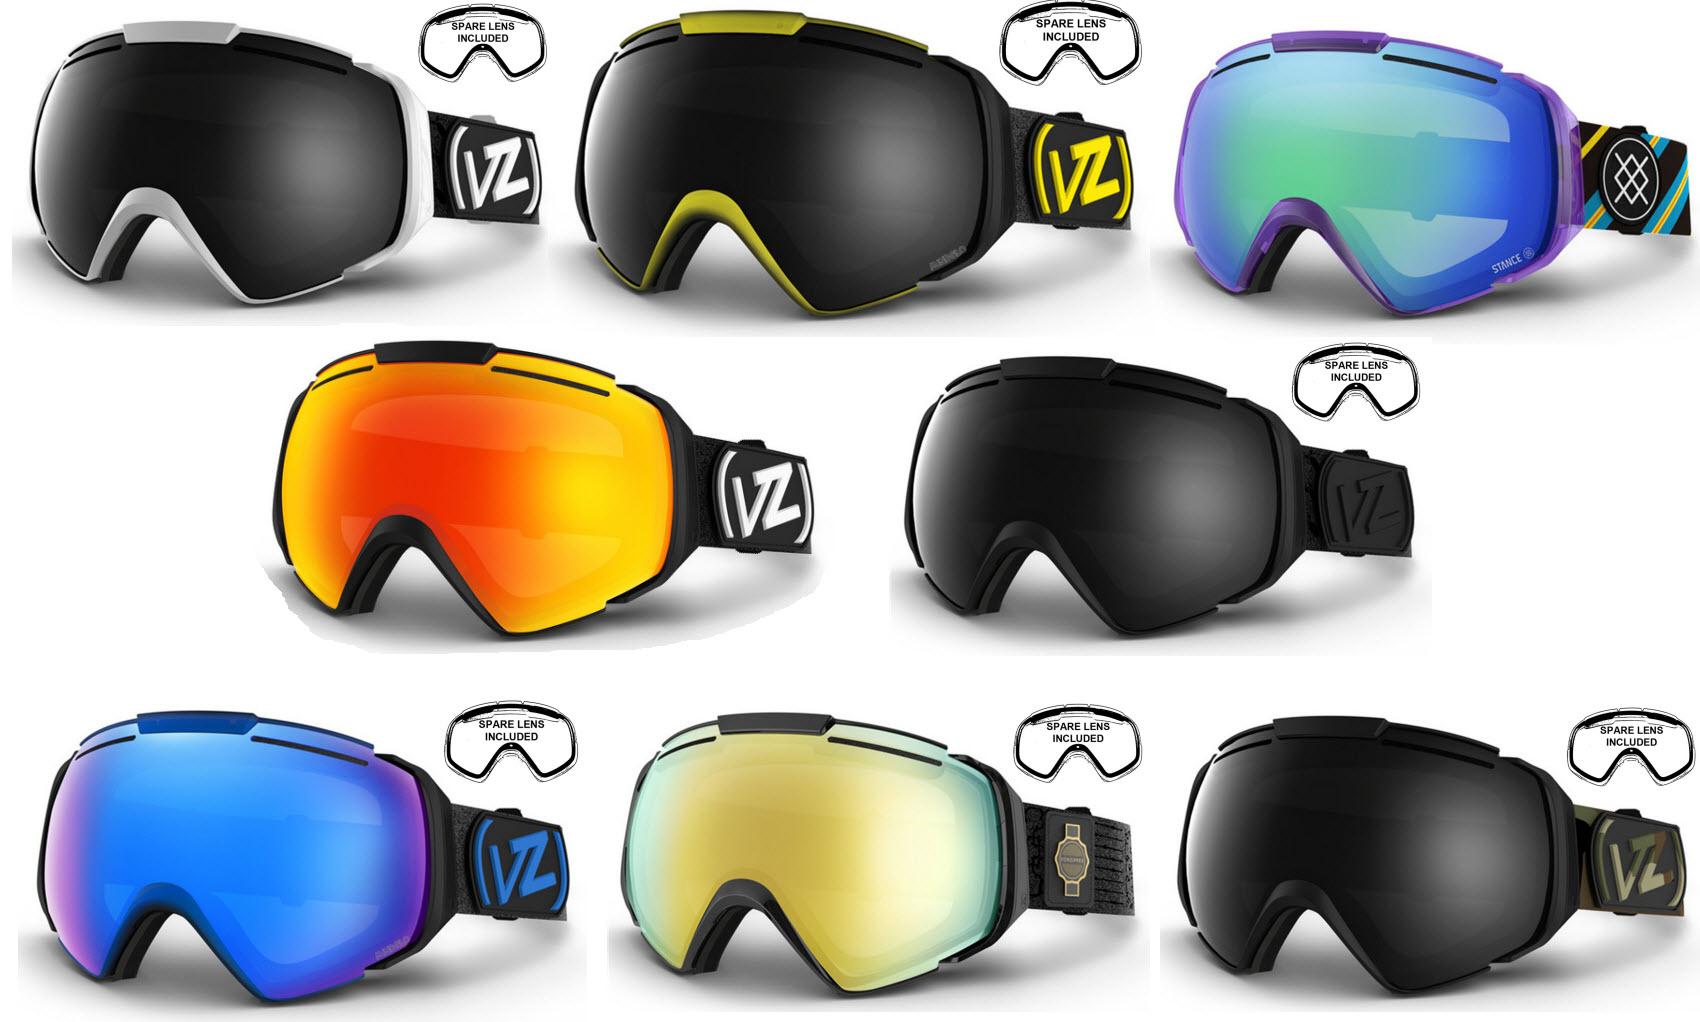 best ski goggles 2015  Von Zipper El Kabong Snowboard Ski Goggles 2015 Various Colours ...